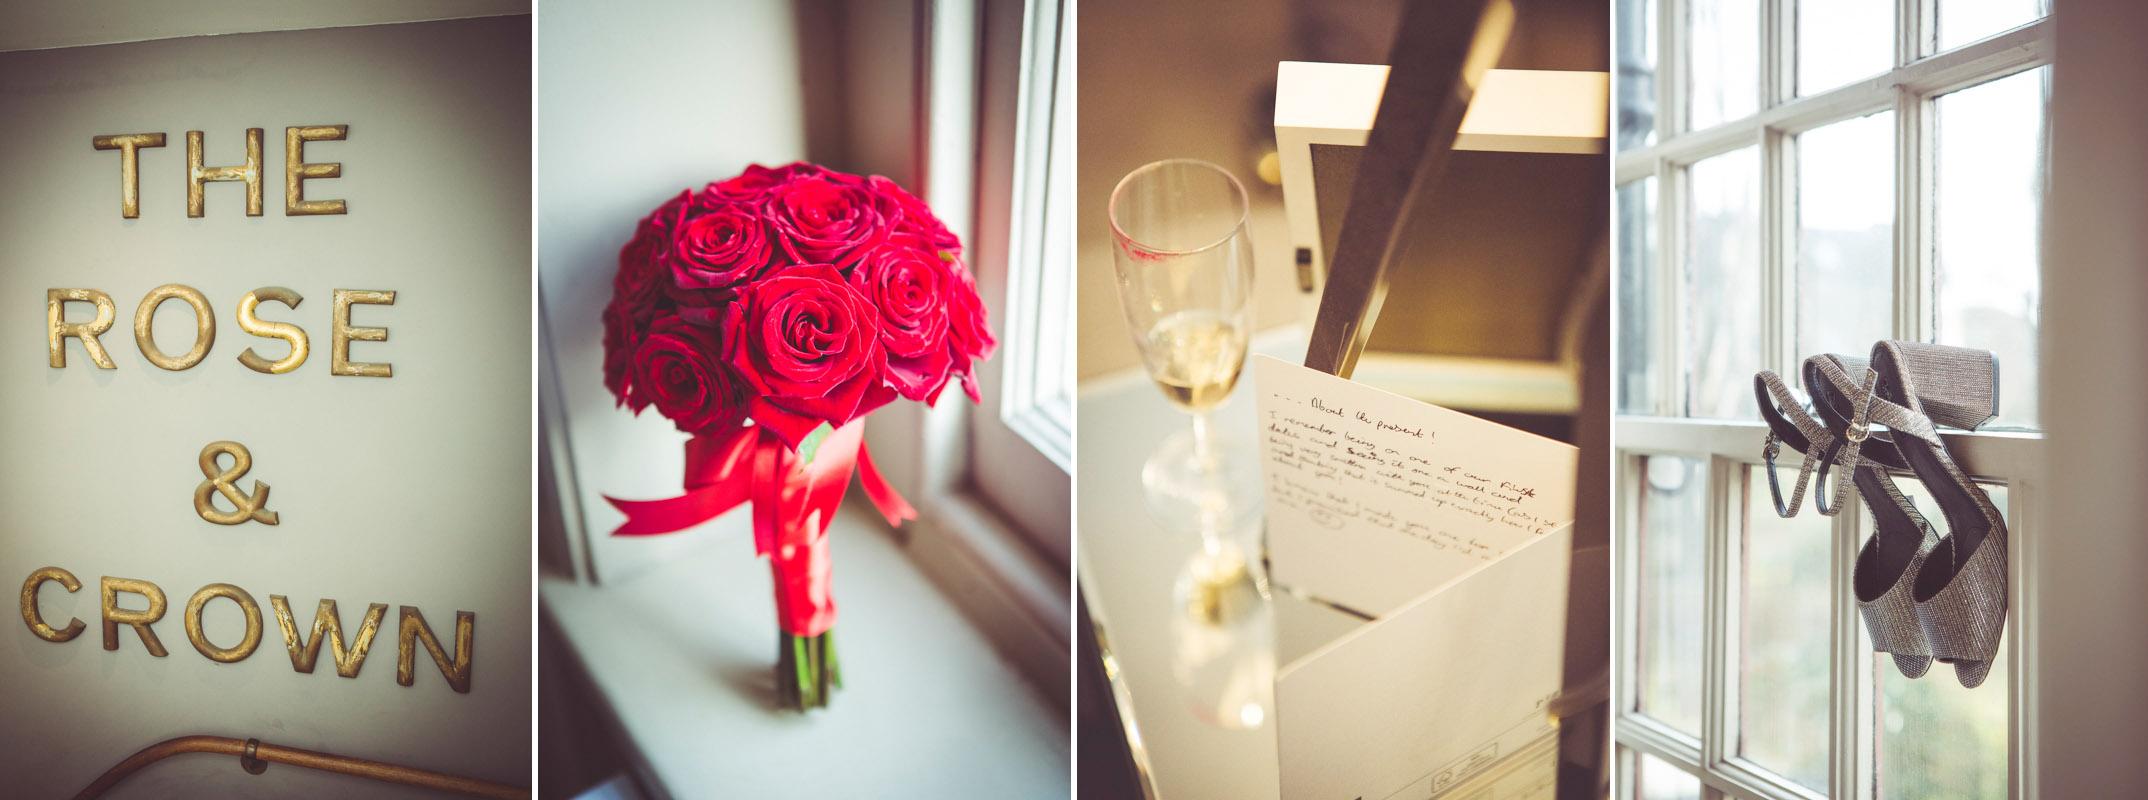 My Beautiful Bride wedding Photography 2.jpg